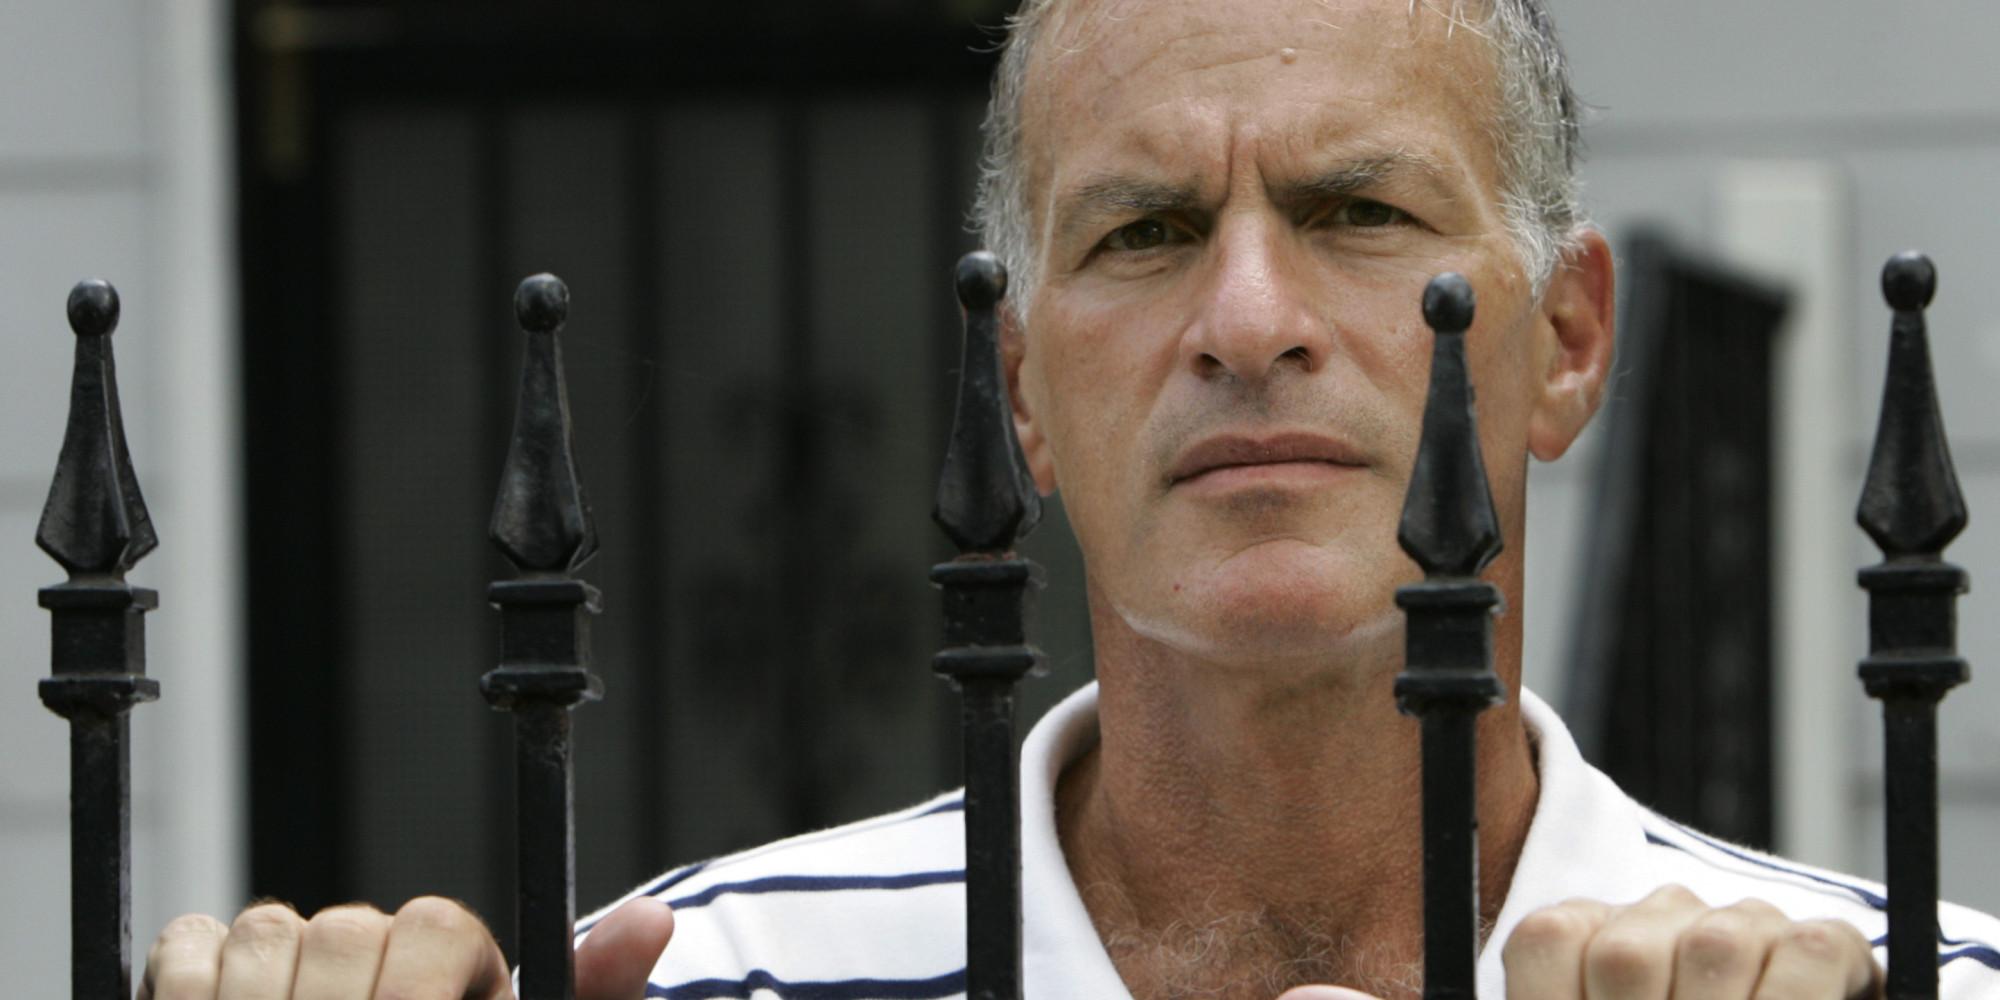 Norman G. Finkelstein